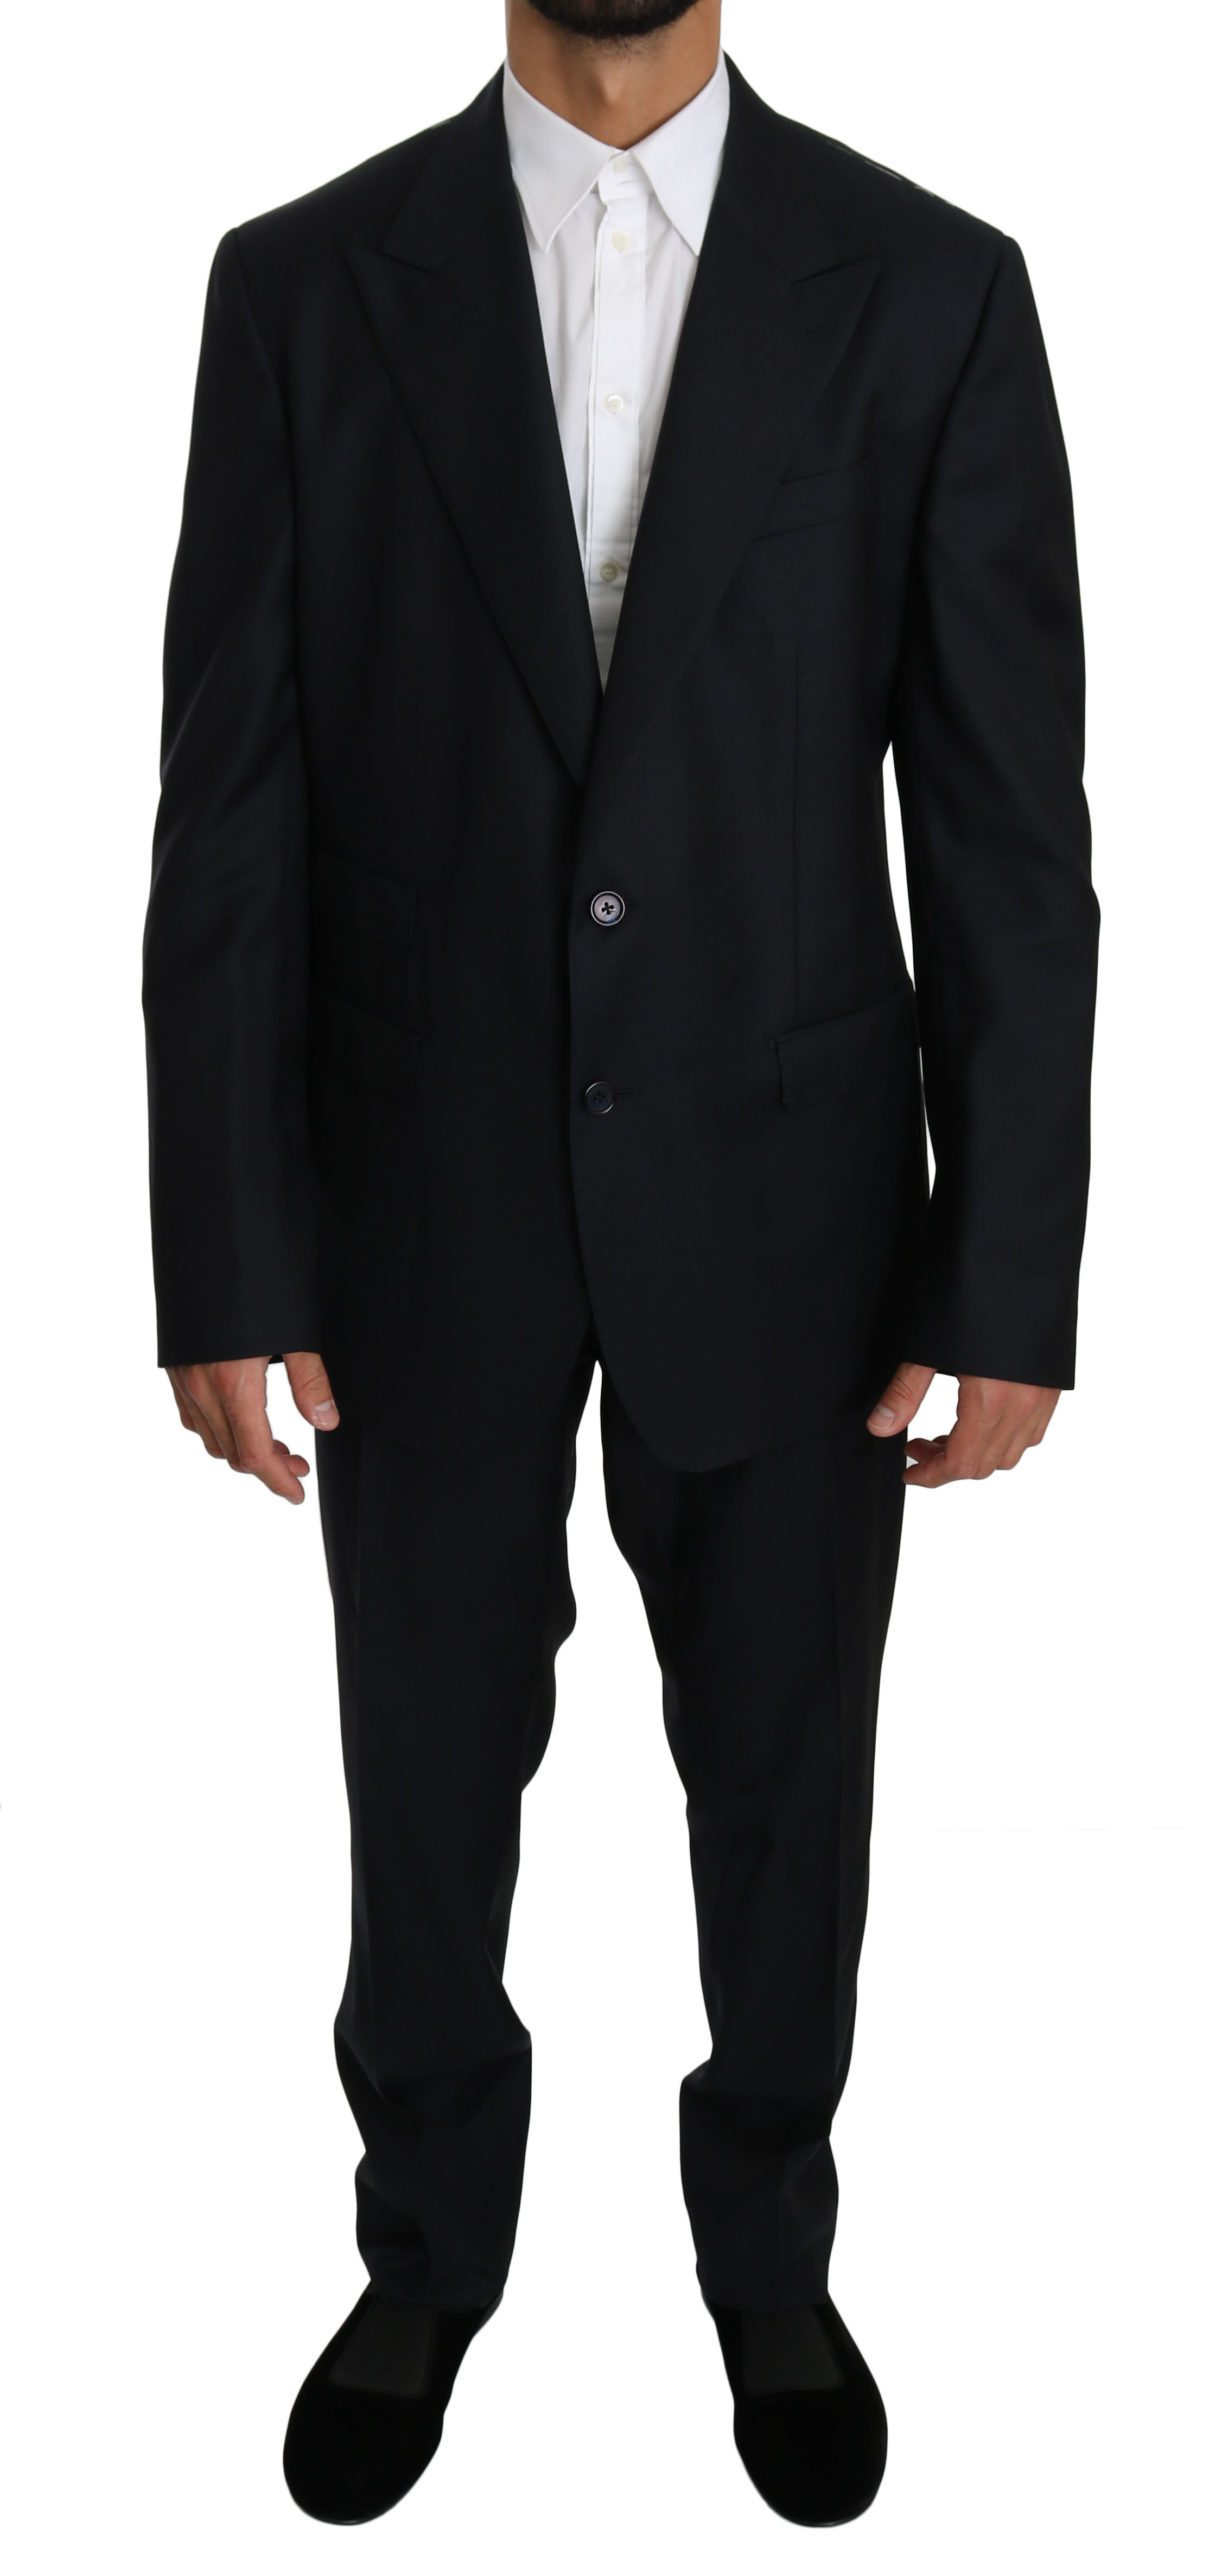 Dolce & Gabbana Men's Wool Slim Fit 2 Piece NAPOLI Suit Blue KOS1612 - IT54 | XL